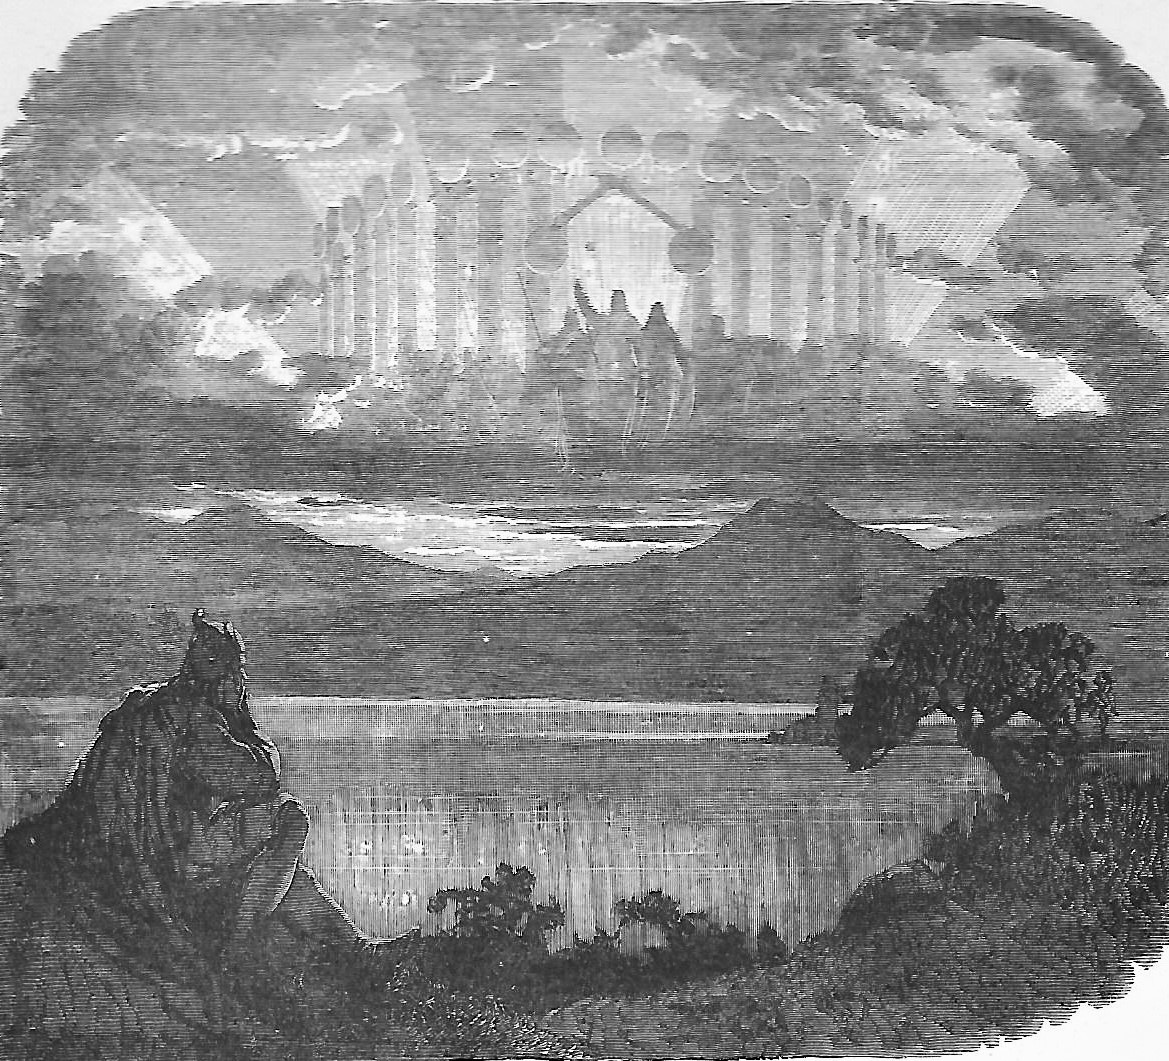 Old illustration of Valhalla